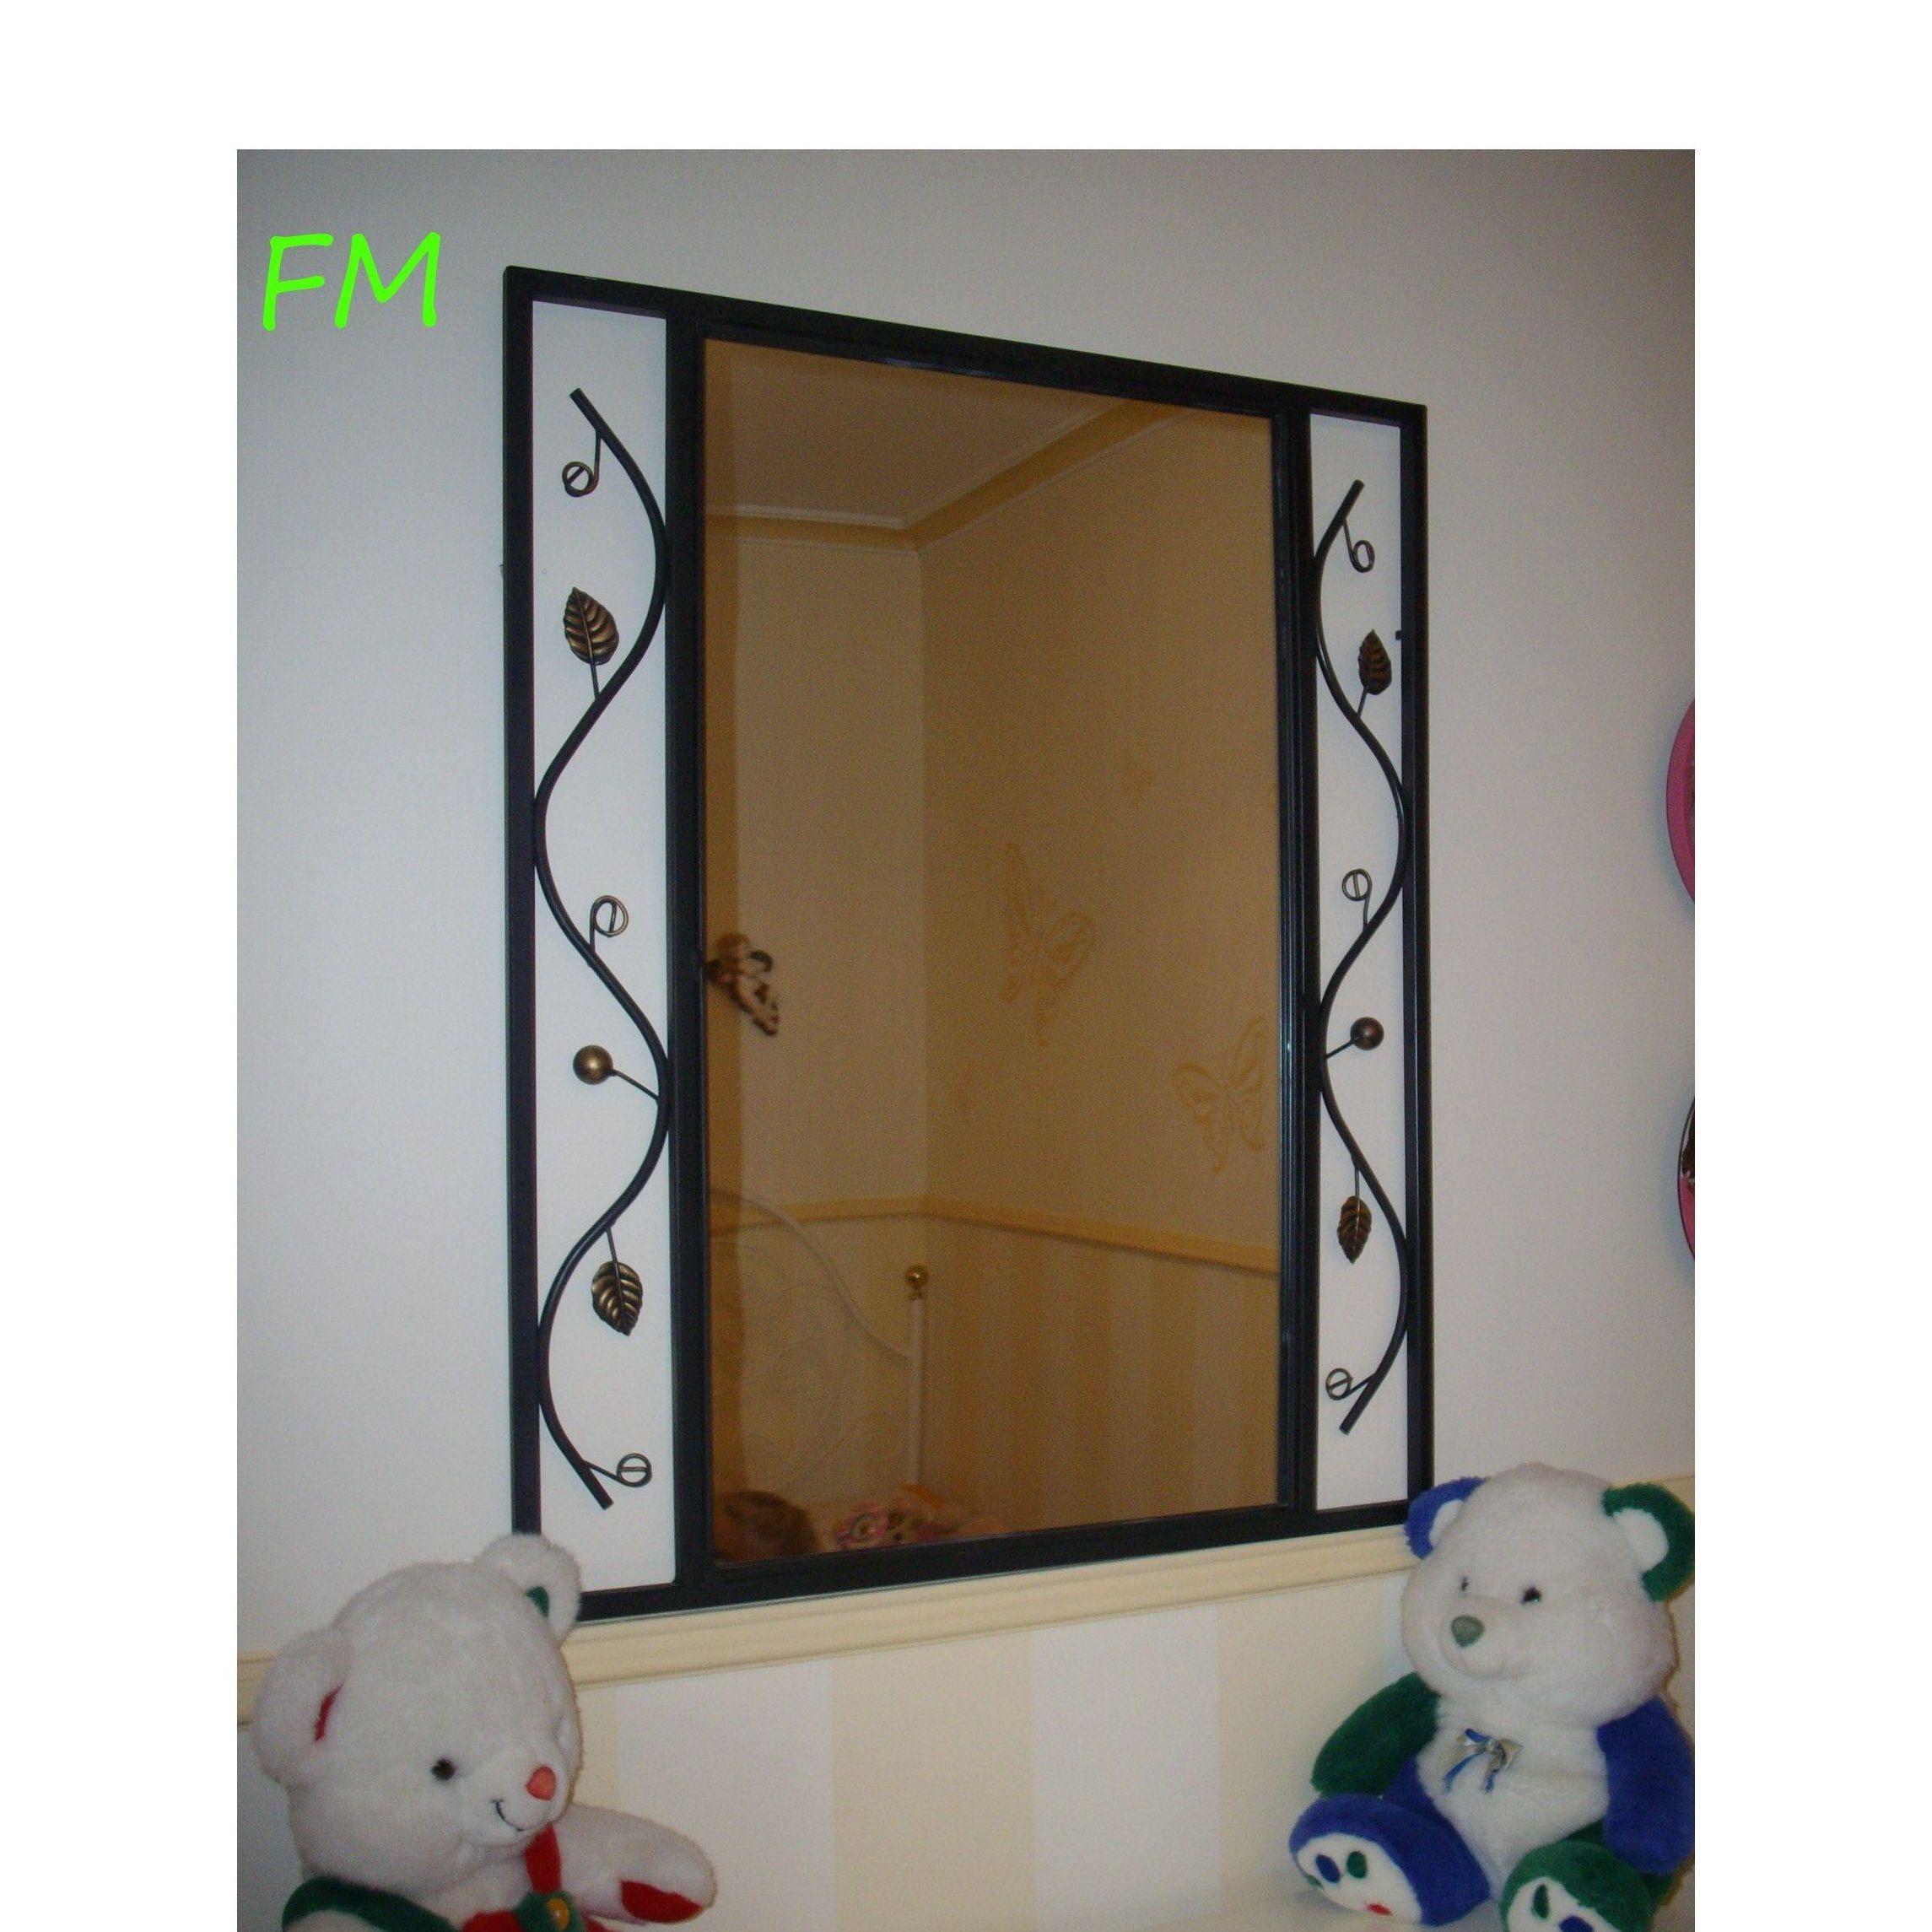 Espejo Negro Margarita: Catálogo de muebles de forja de Forja Manuel Jiménez